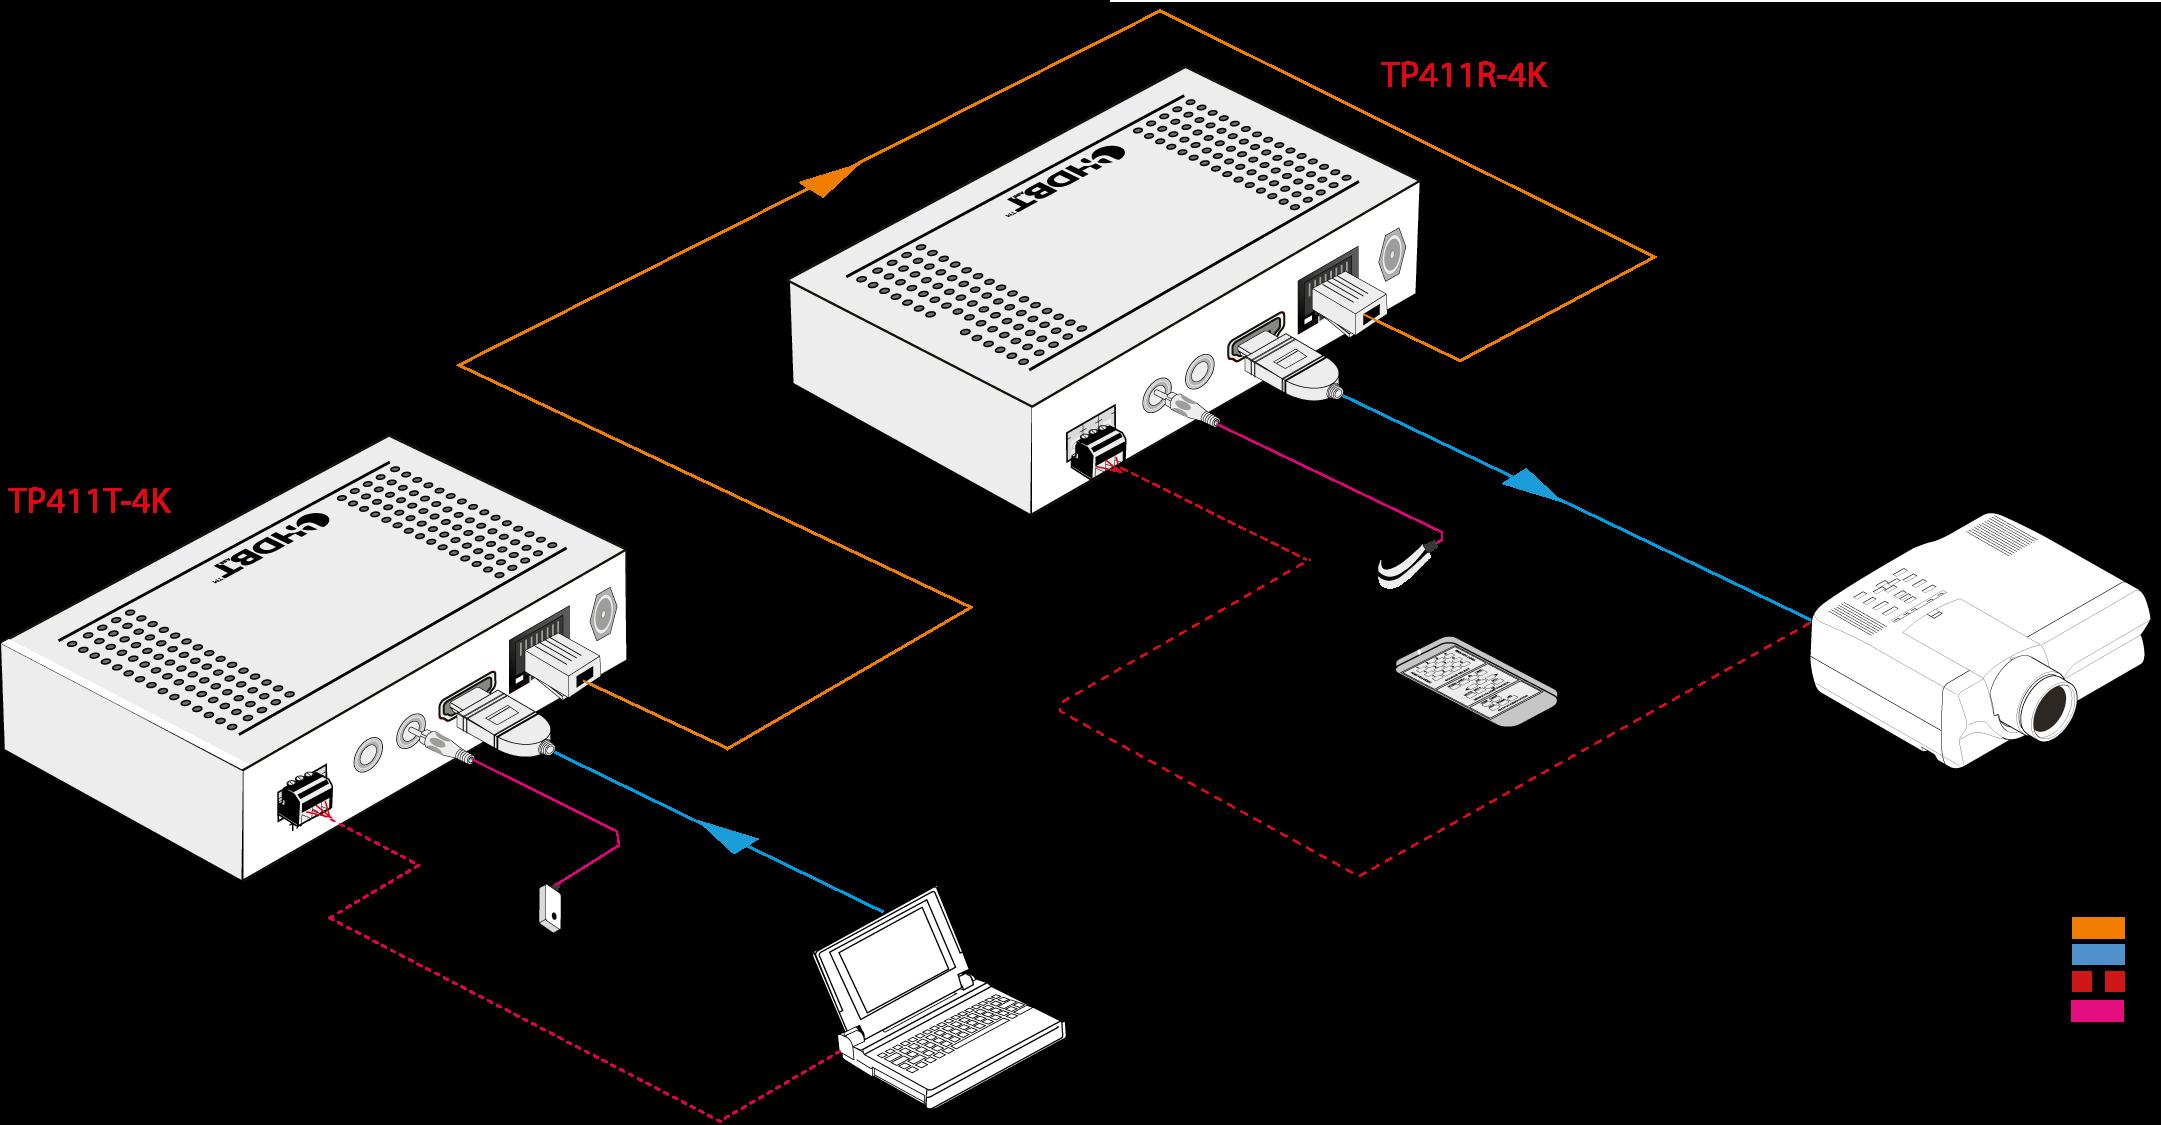 TP411P-4K | Kit extendeur HDMI HdBaseT 70m ultra fin